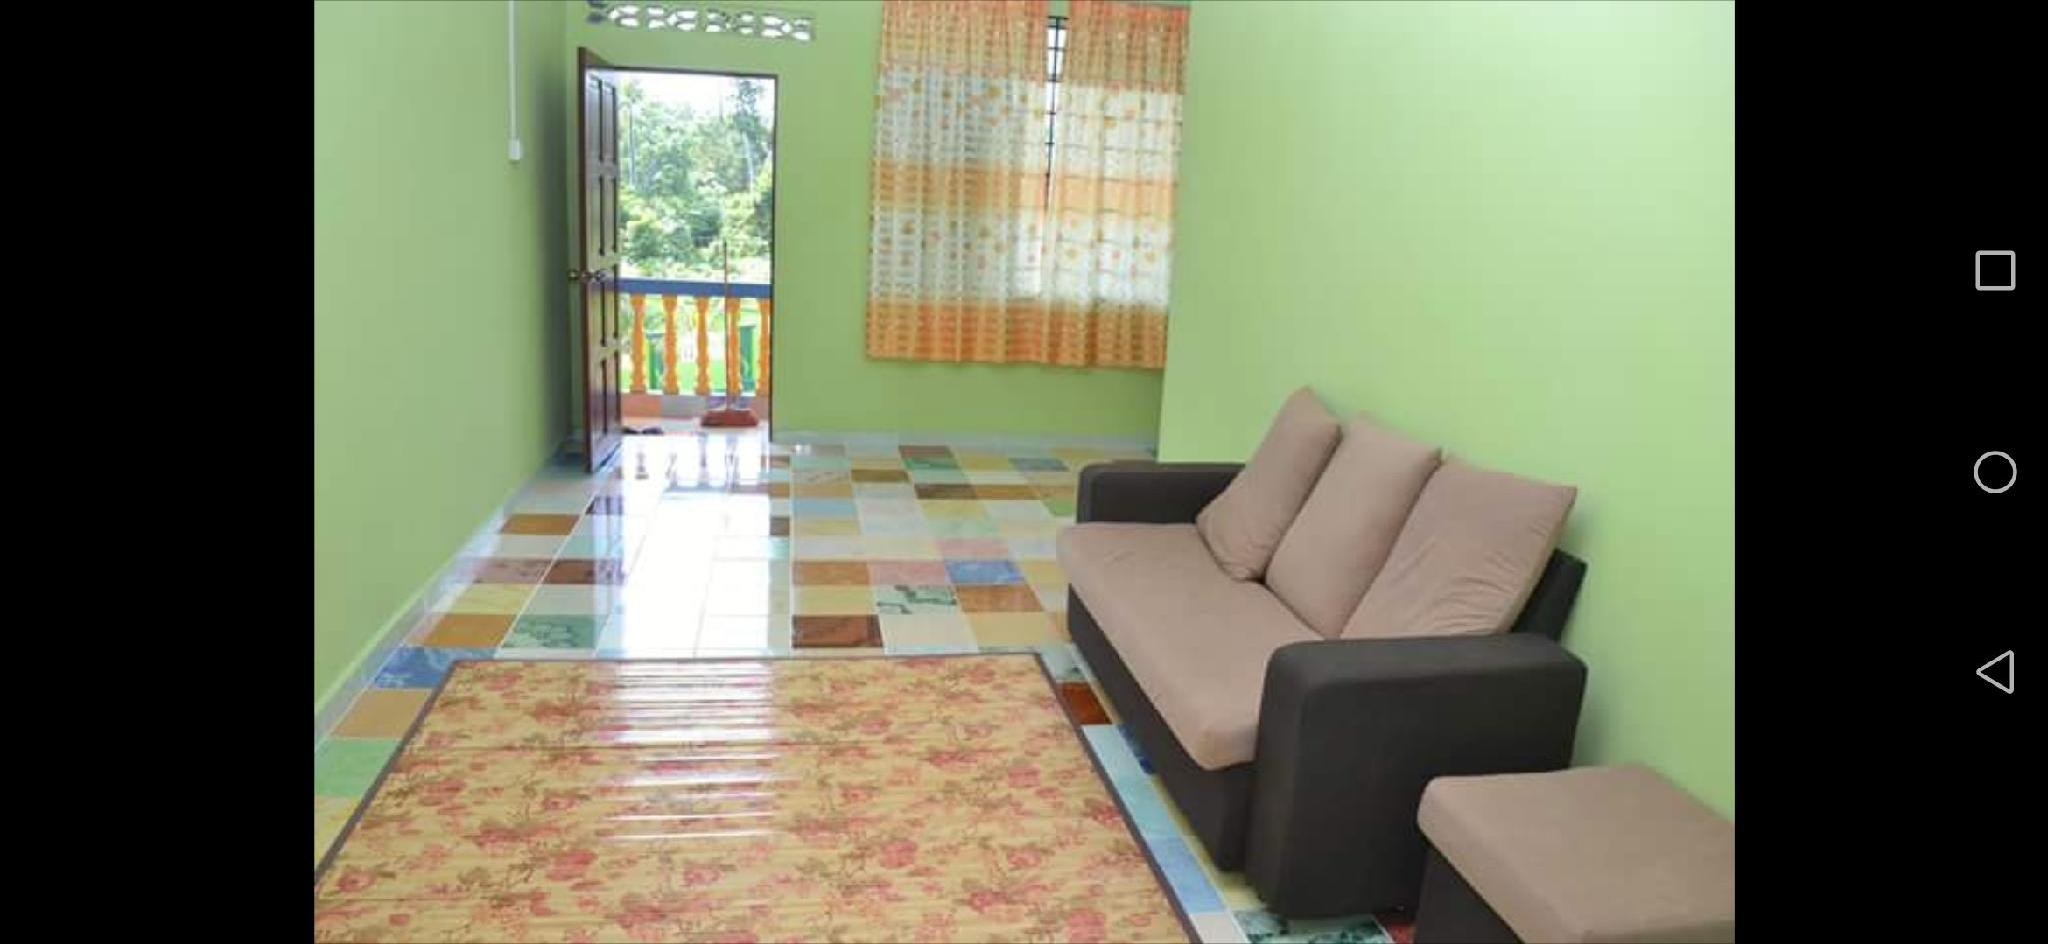 HomeStay Wisma Hajah Norhasimah